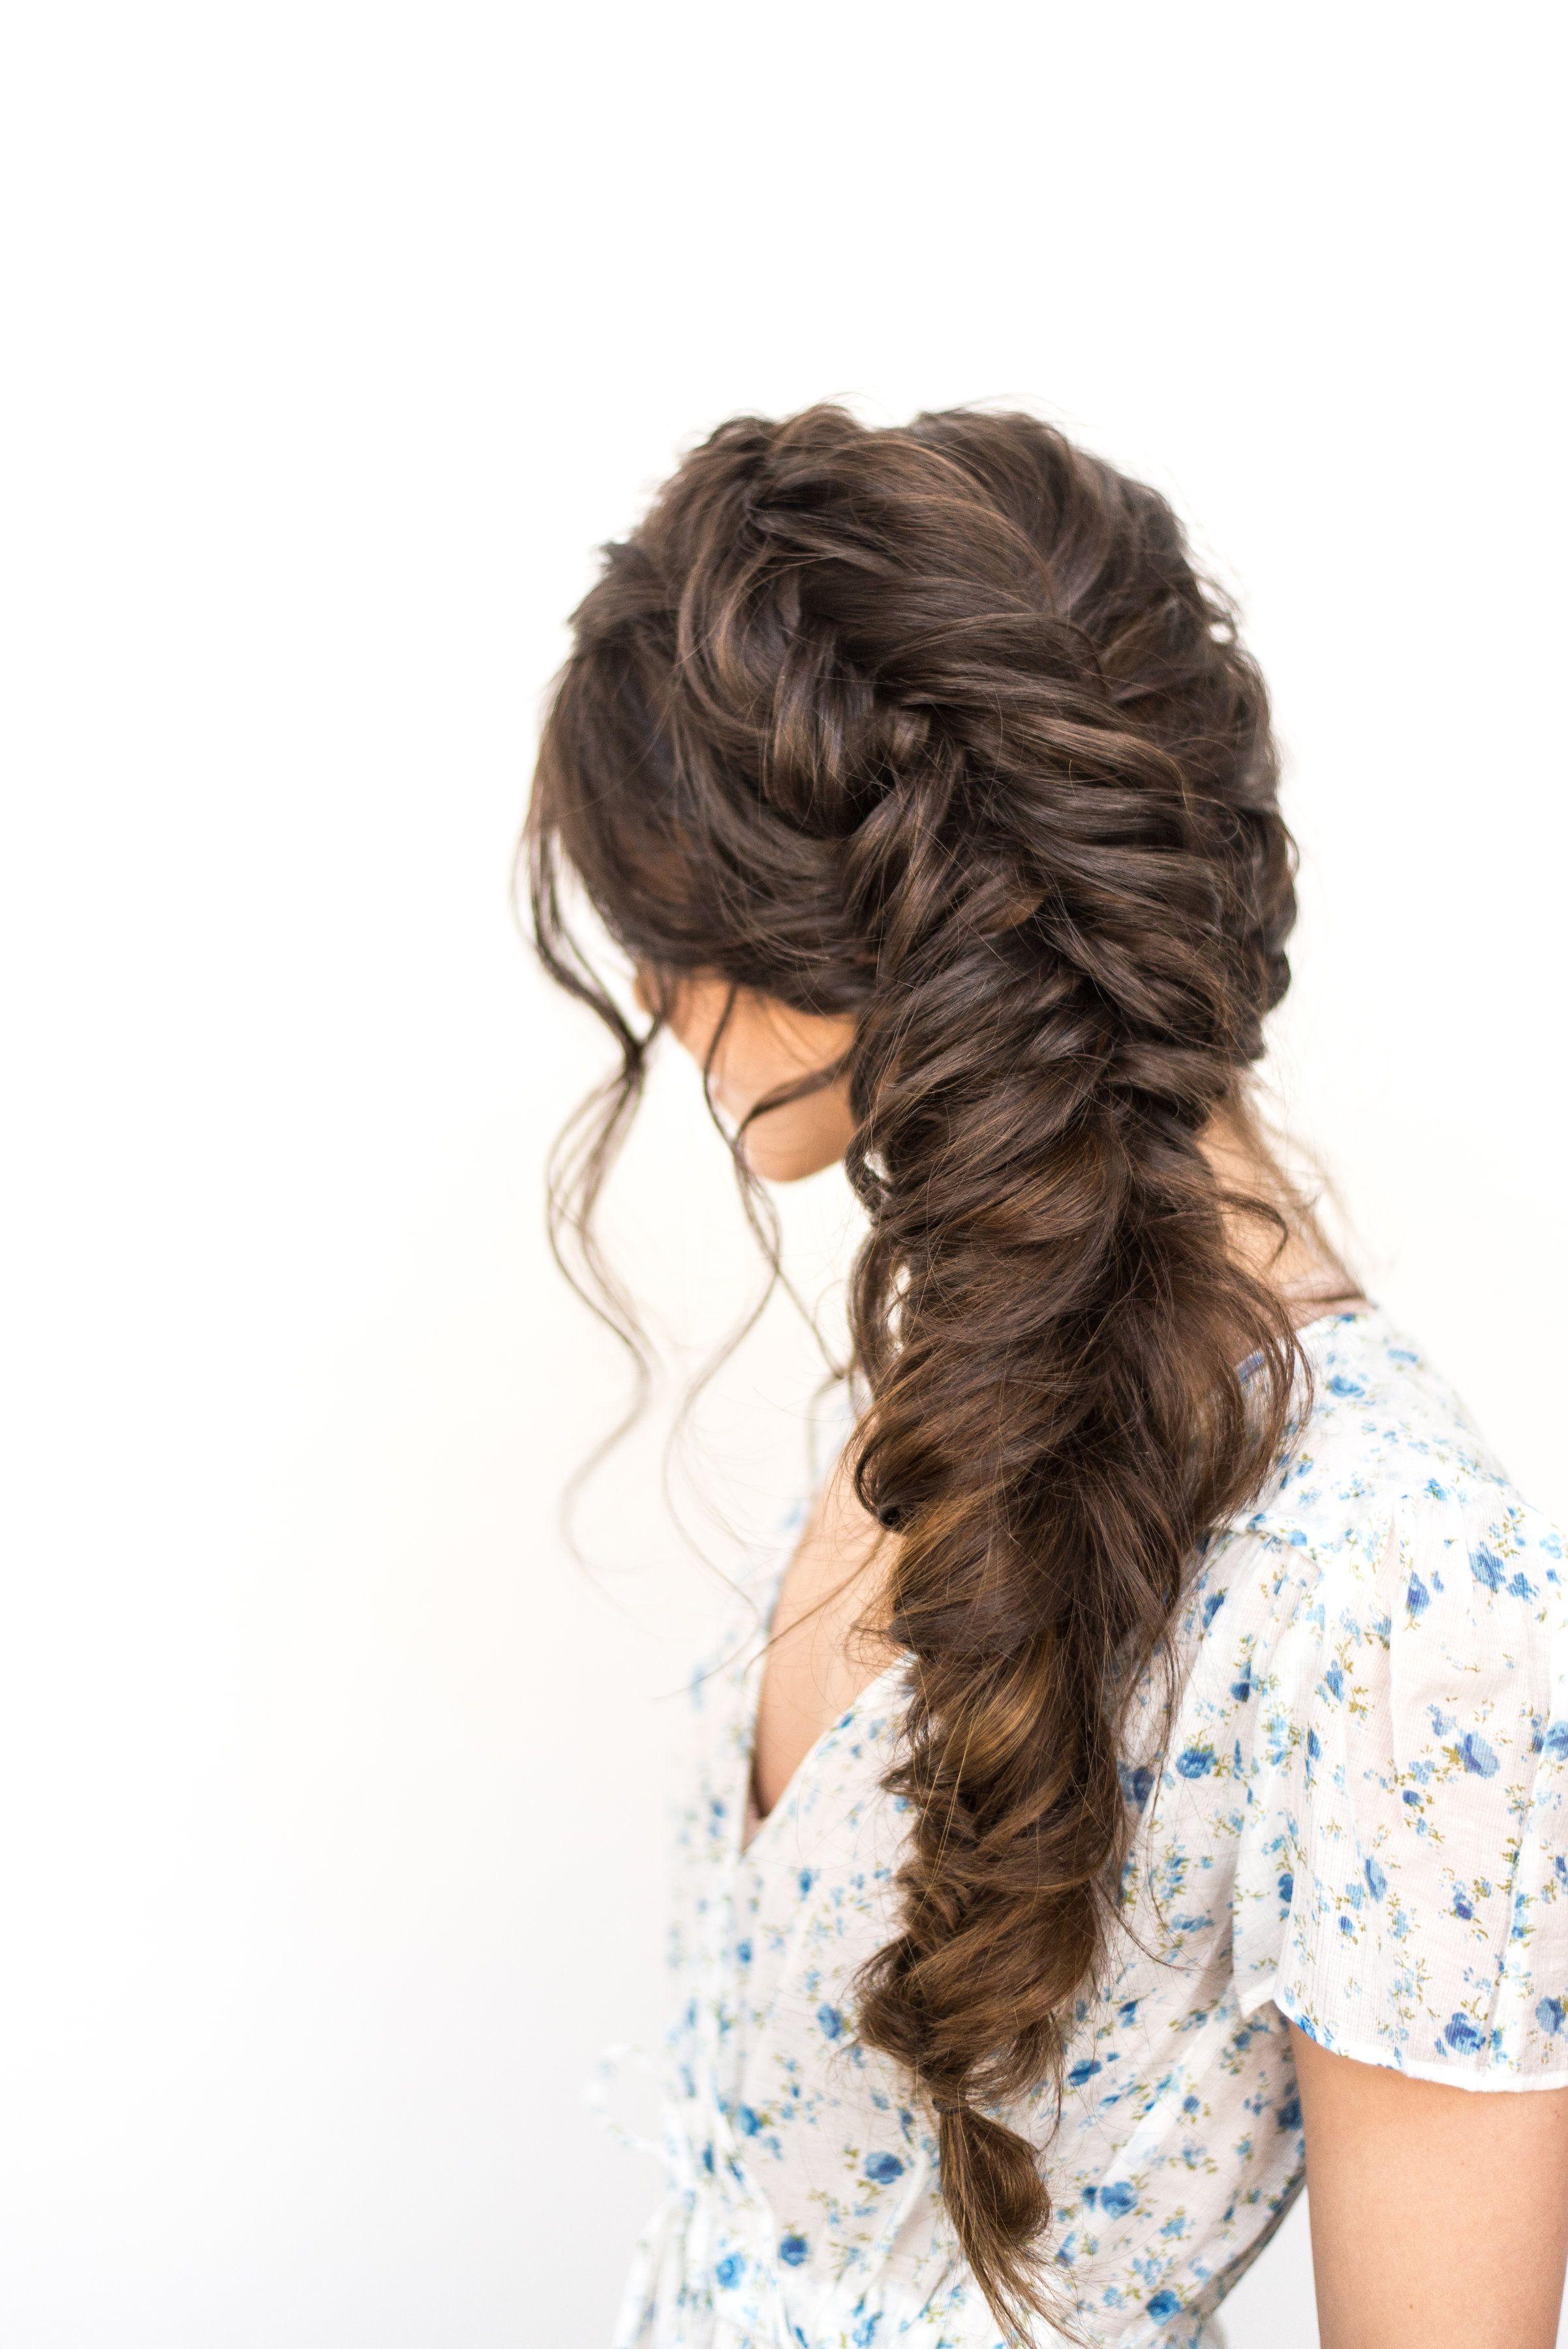 Pin by verena miezi on fashion u shoes pinterest hair style